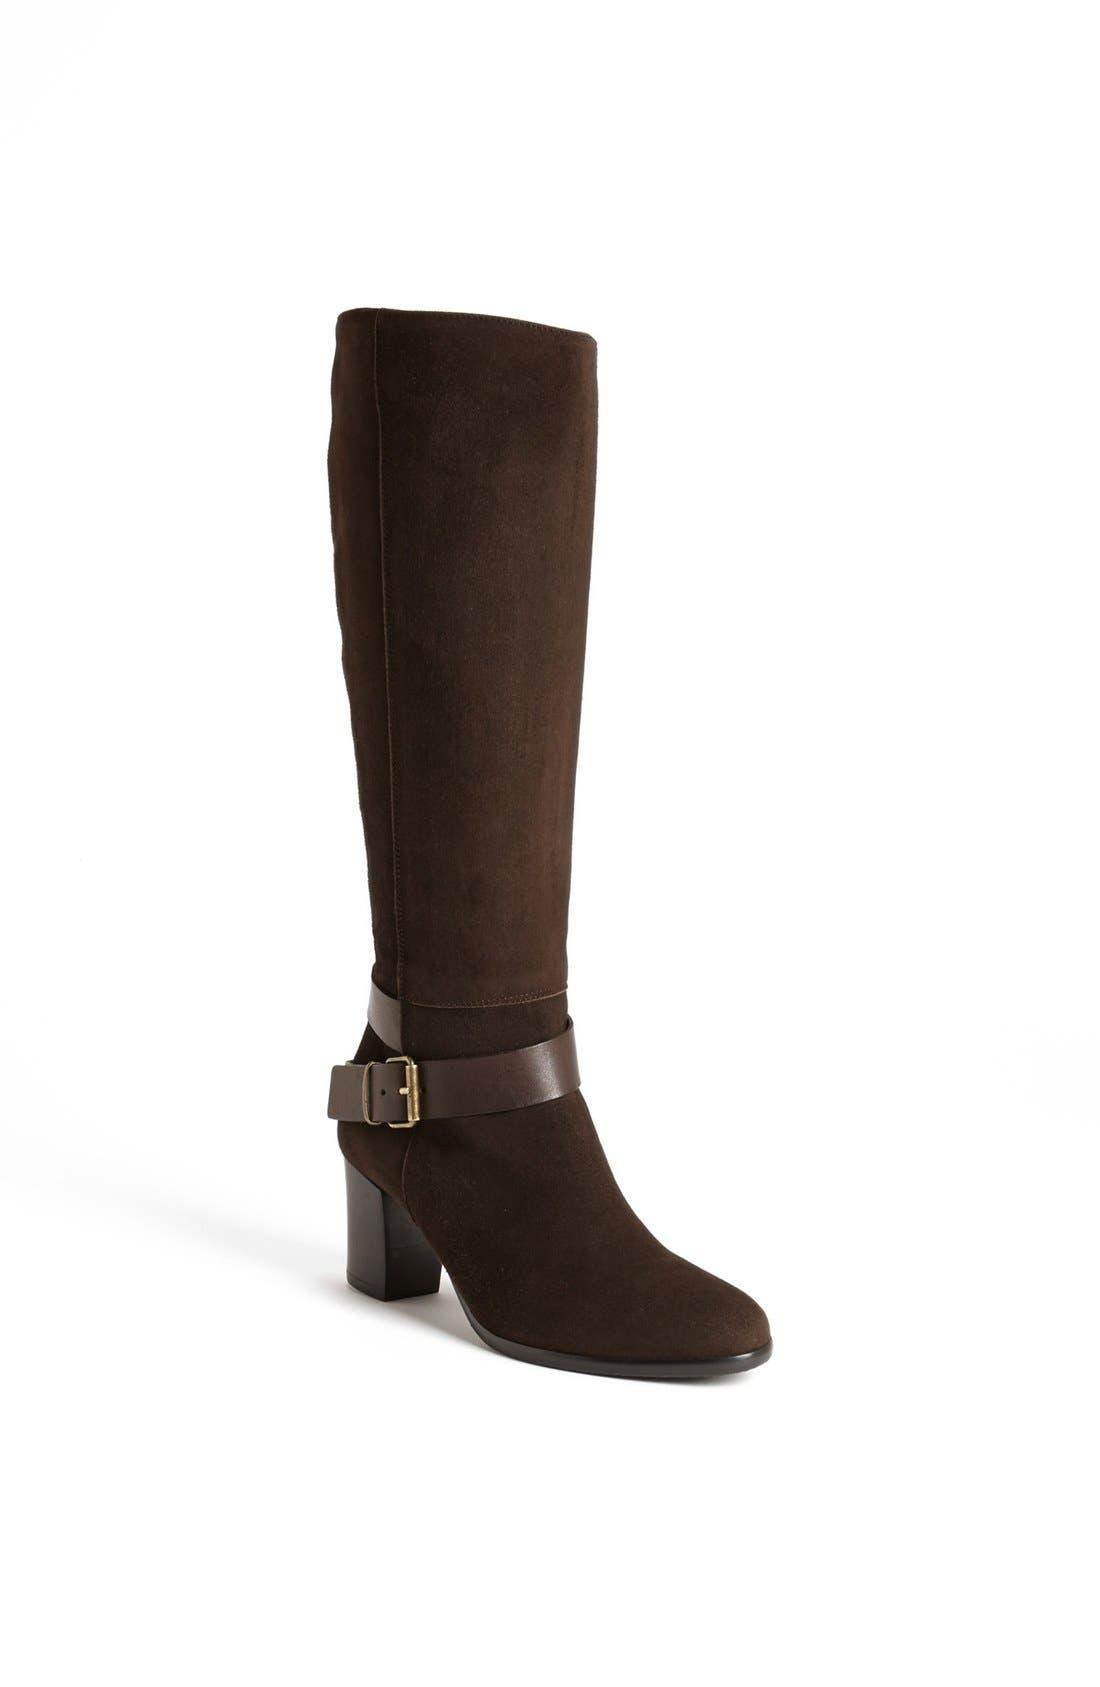 Alternate Image 1 Selected - Cordani 'Vasquez' Tall Italian Suede Boot